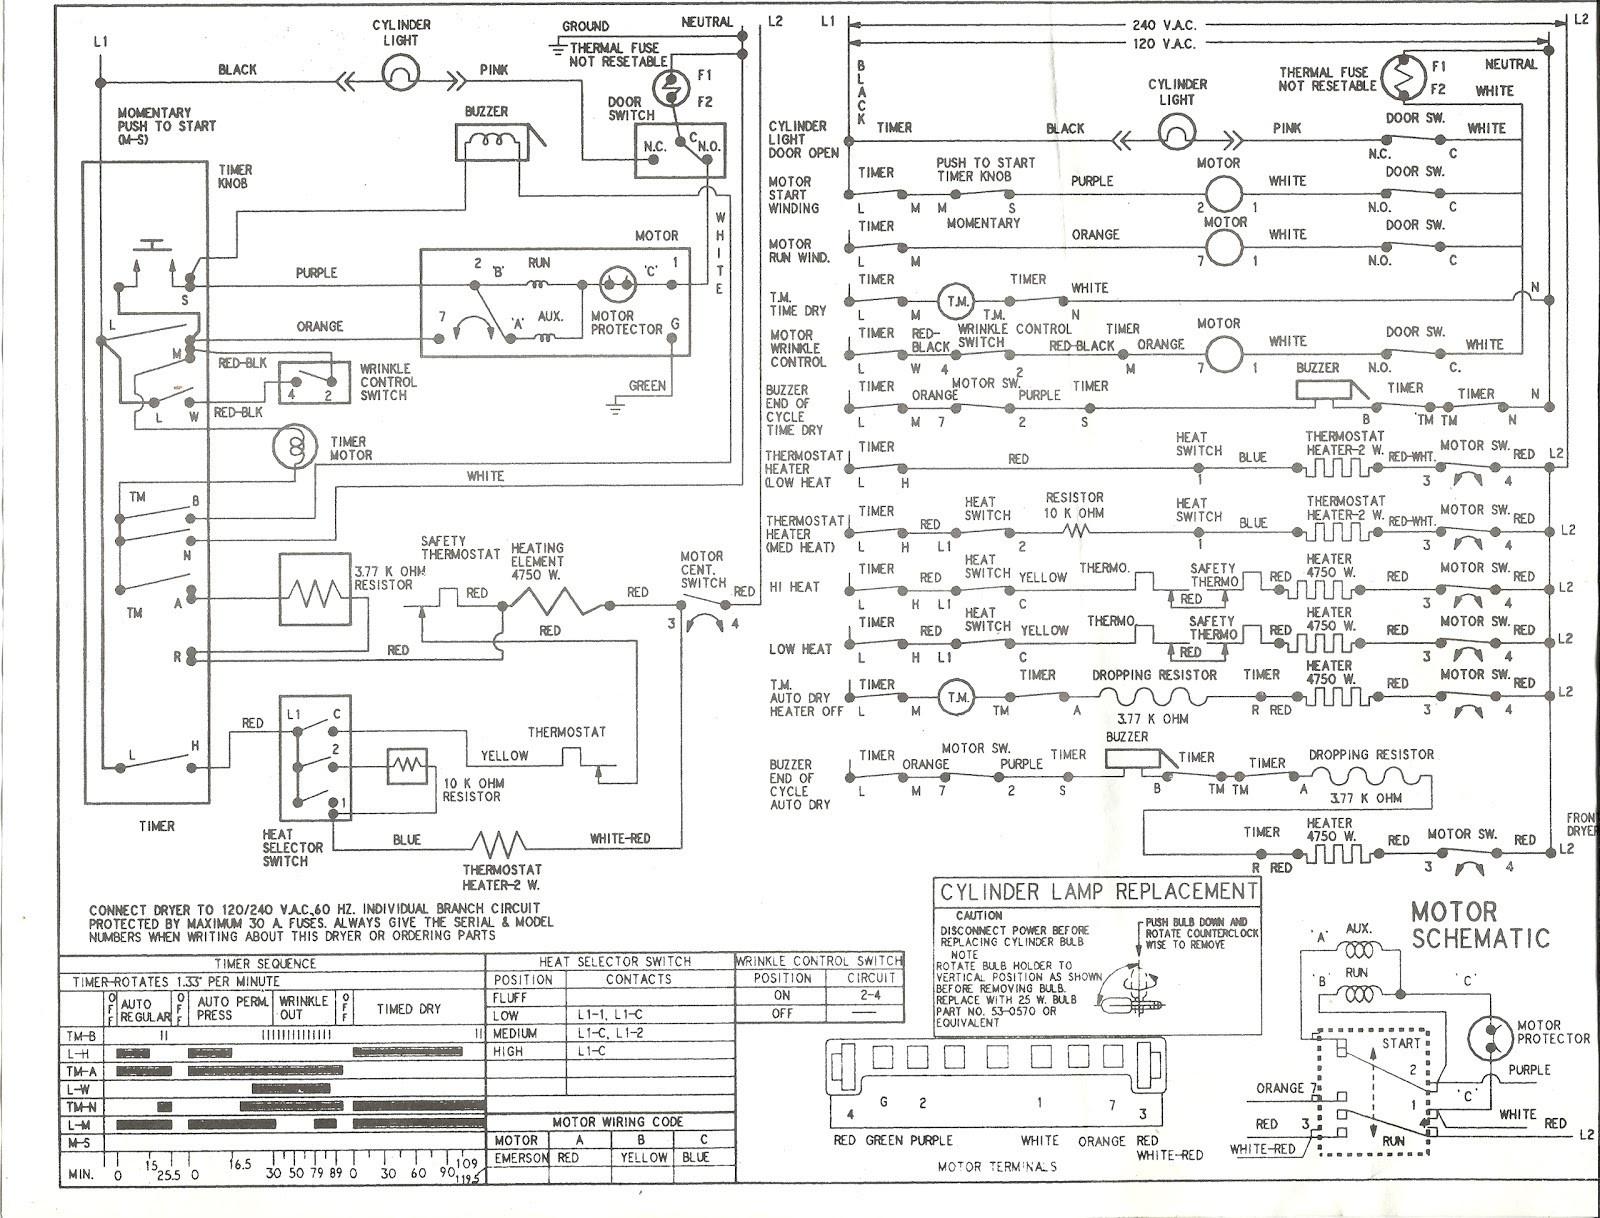 kenmore dryer power cord wiring diagram Collection-Wiring Diagram Kenmore Dryer 2017 Wiring Diagram Appliance Dryer New Kenmore Dryer Power Cord Wiring 3-g